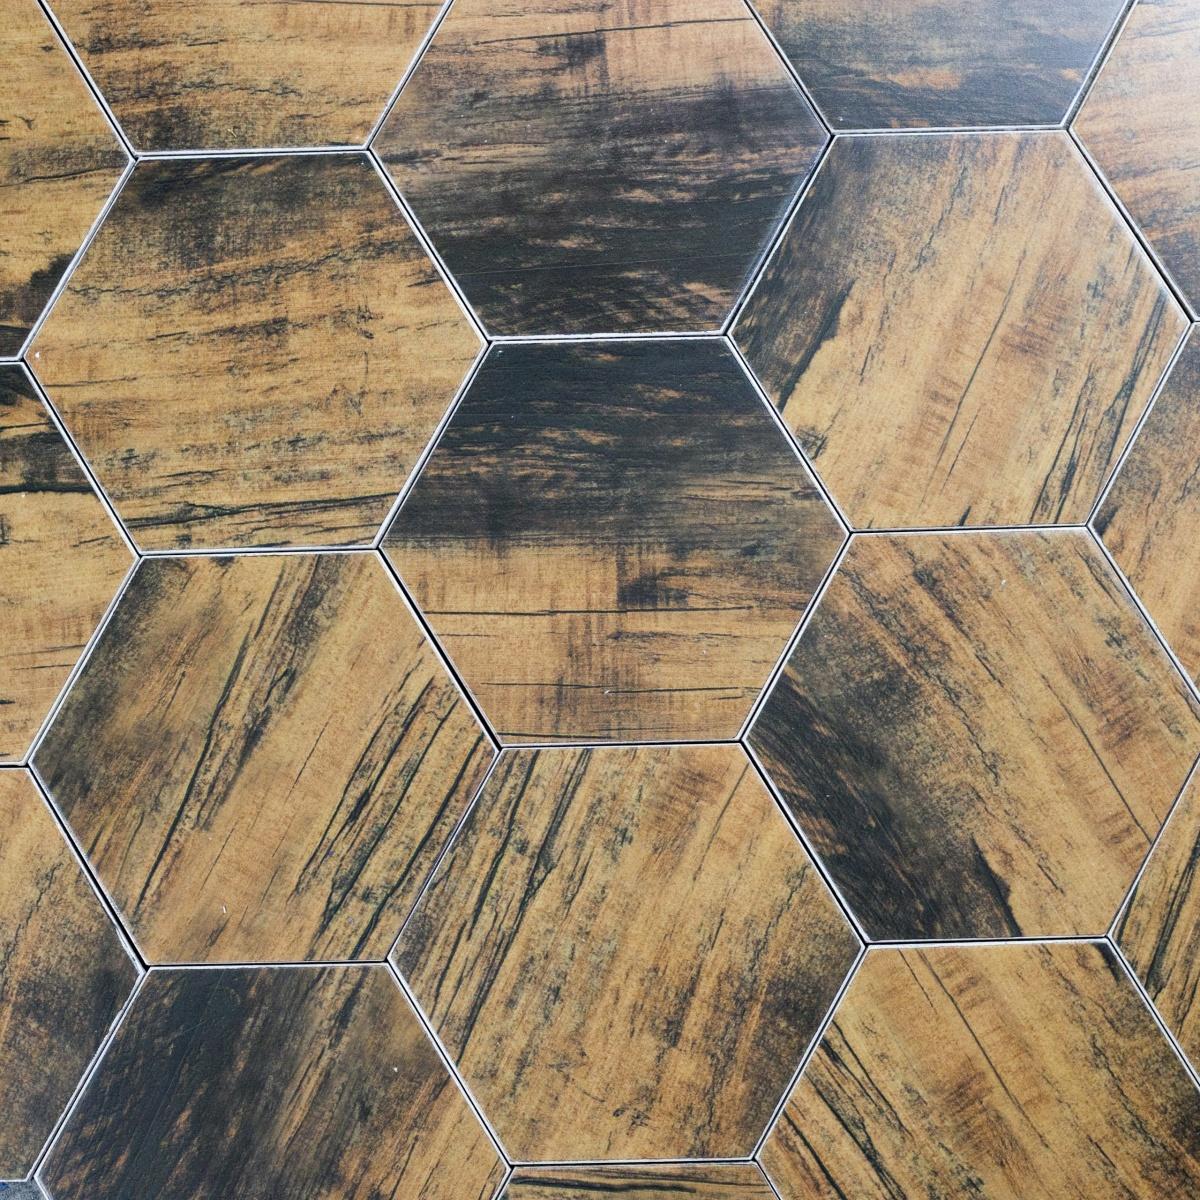 Artisan Wood 8 X 8 Ceramic Hexagon Wood Look Tile In Black Walnut